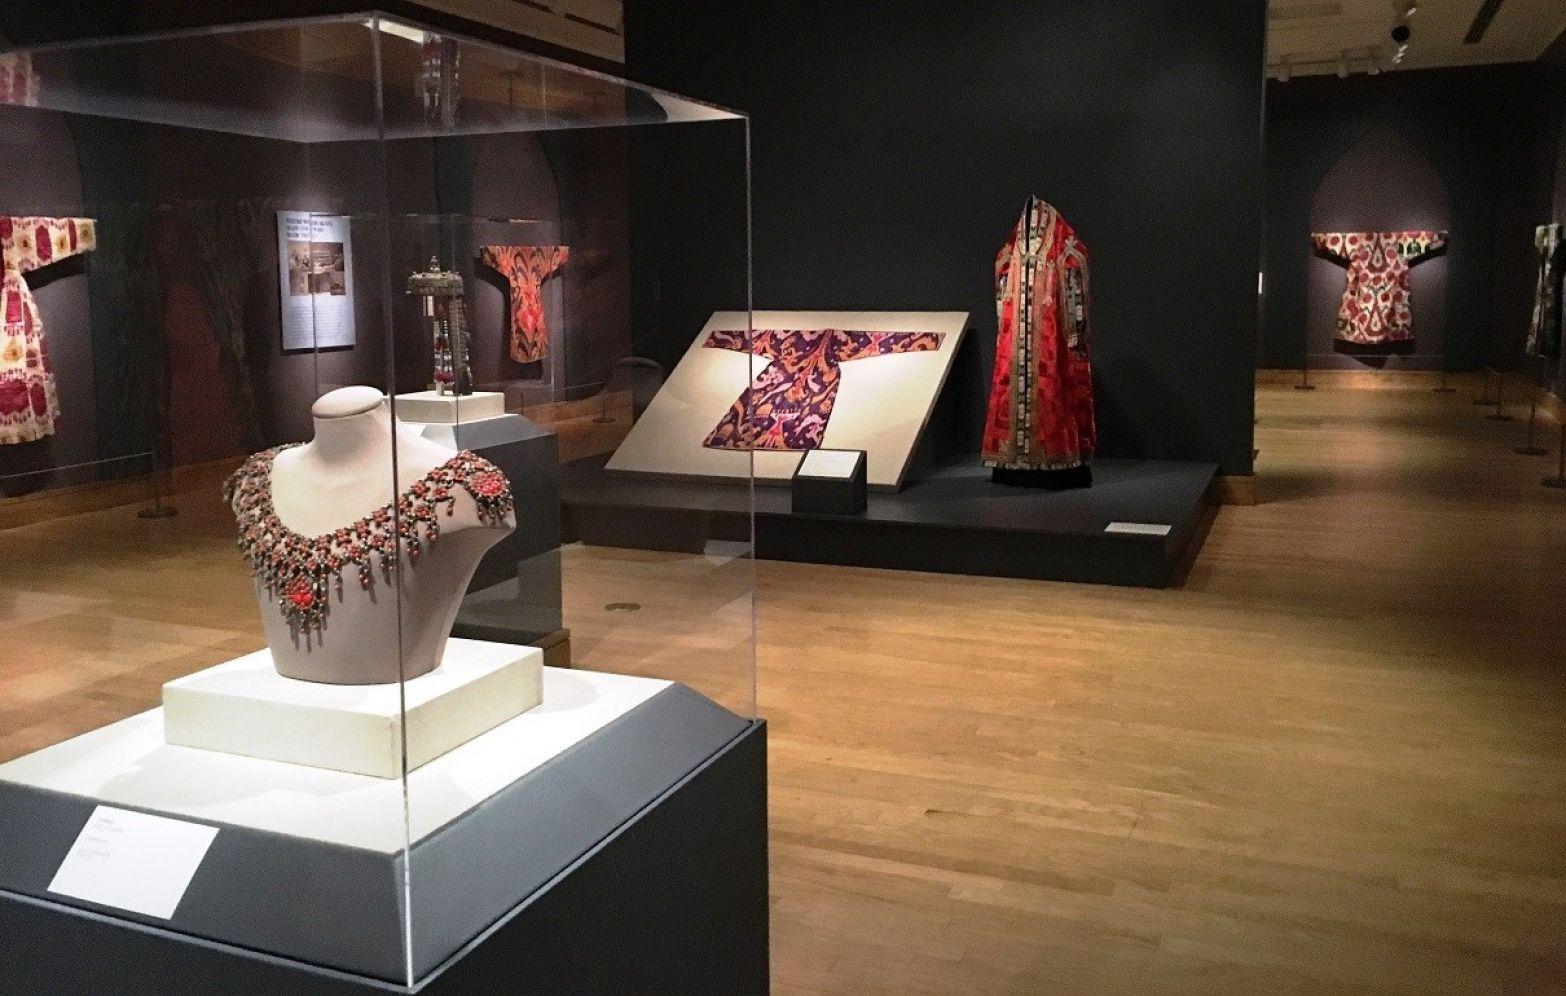 dayton art museum jewelry exhibit